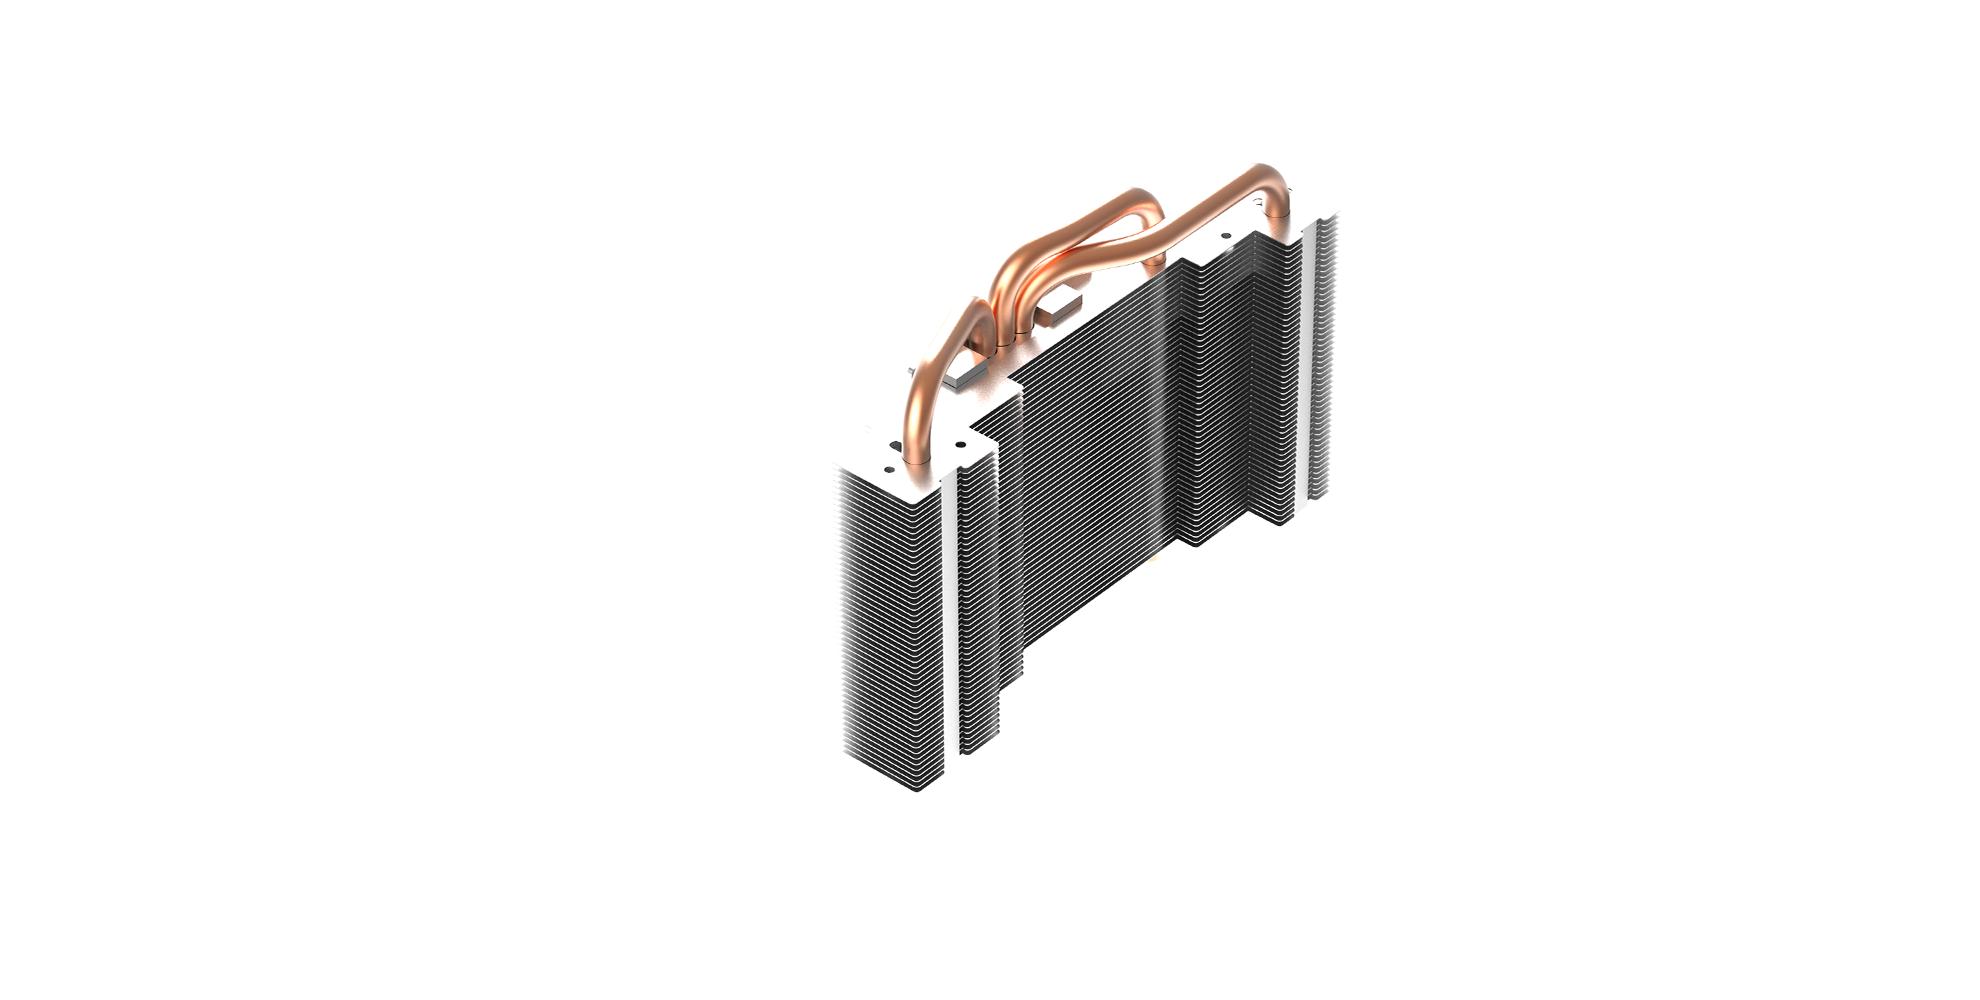 Geforce Rtx 2060 Mini Itx Oc 6g Graphics Card Gigabyte Global